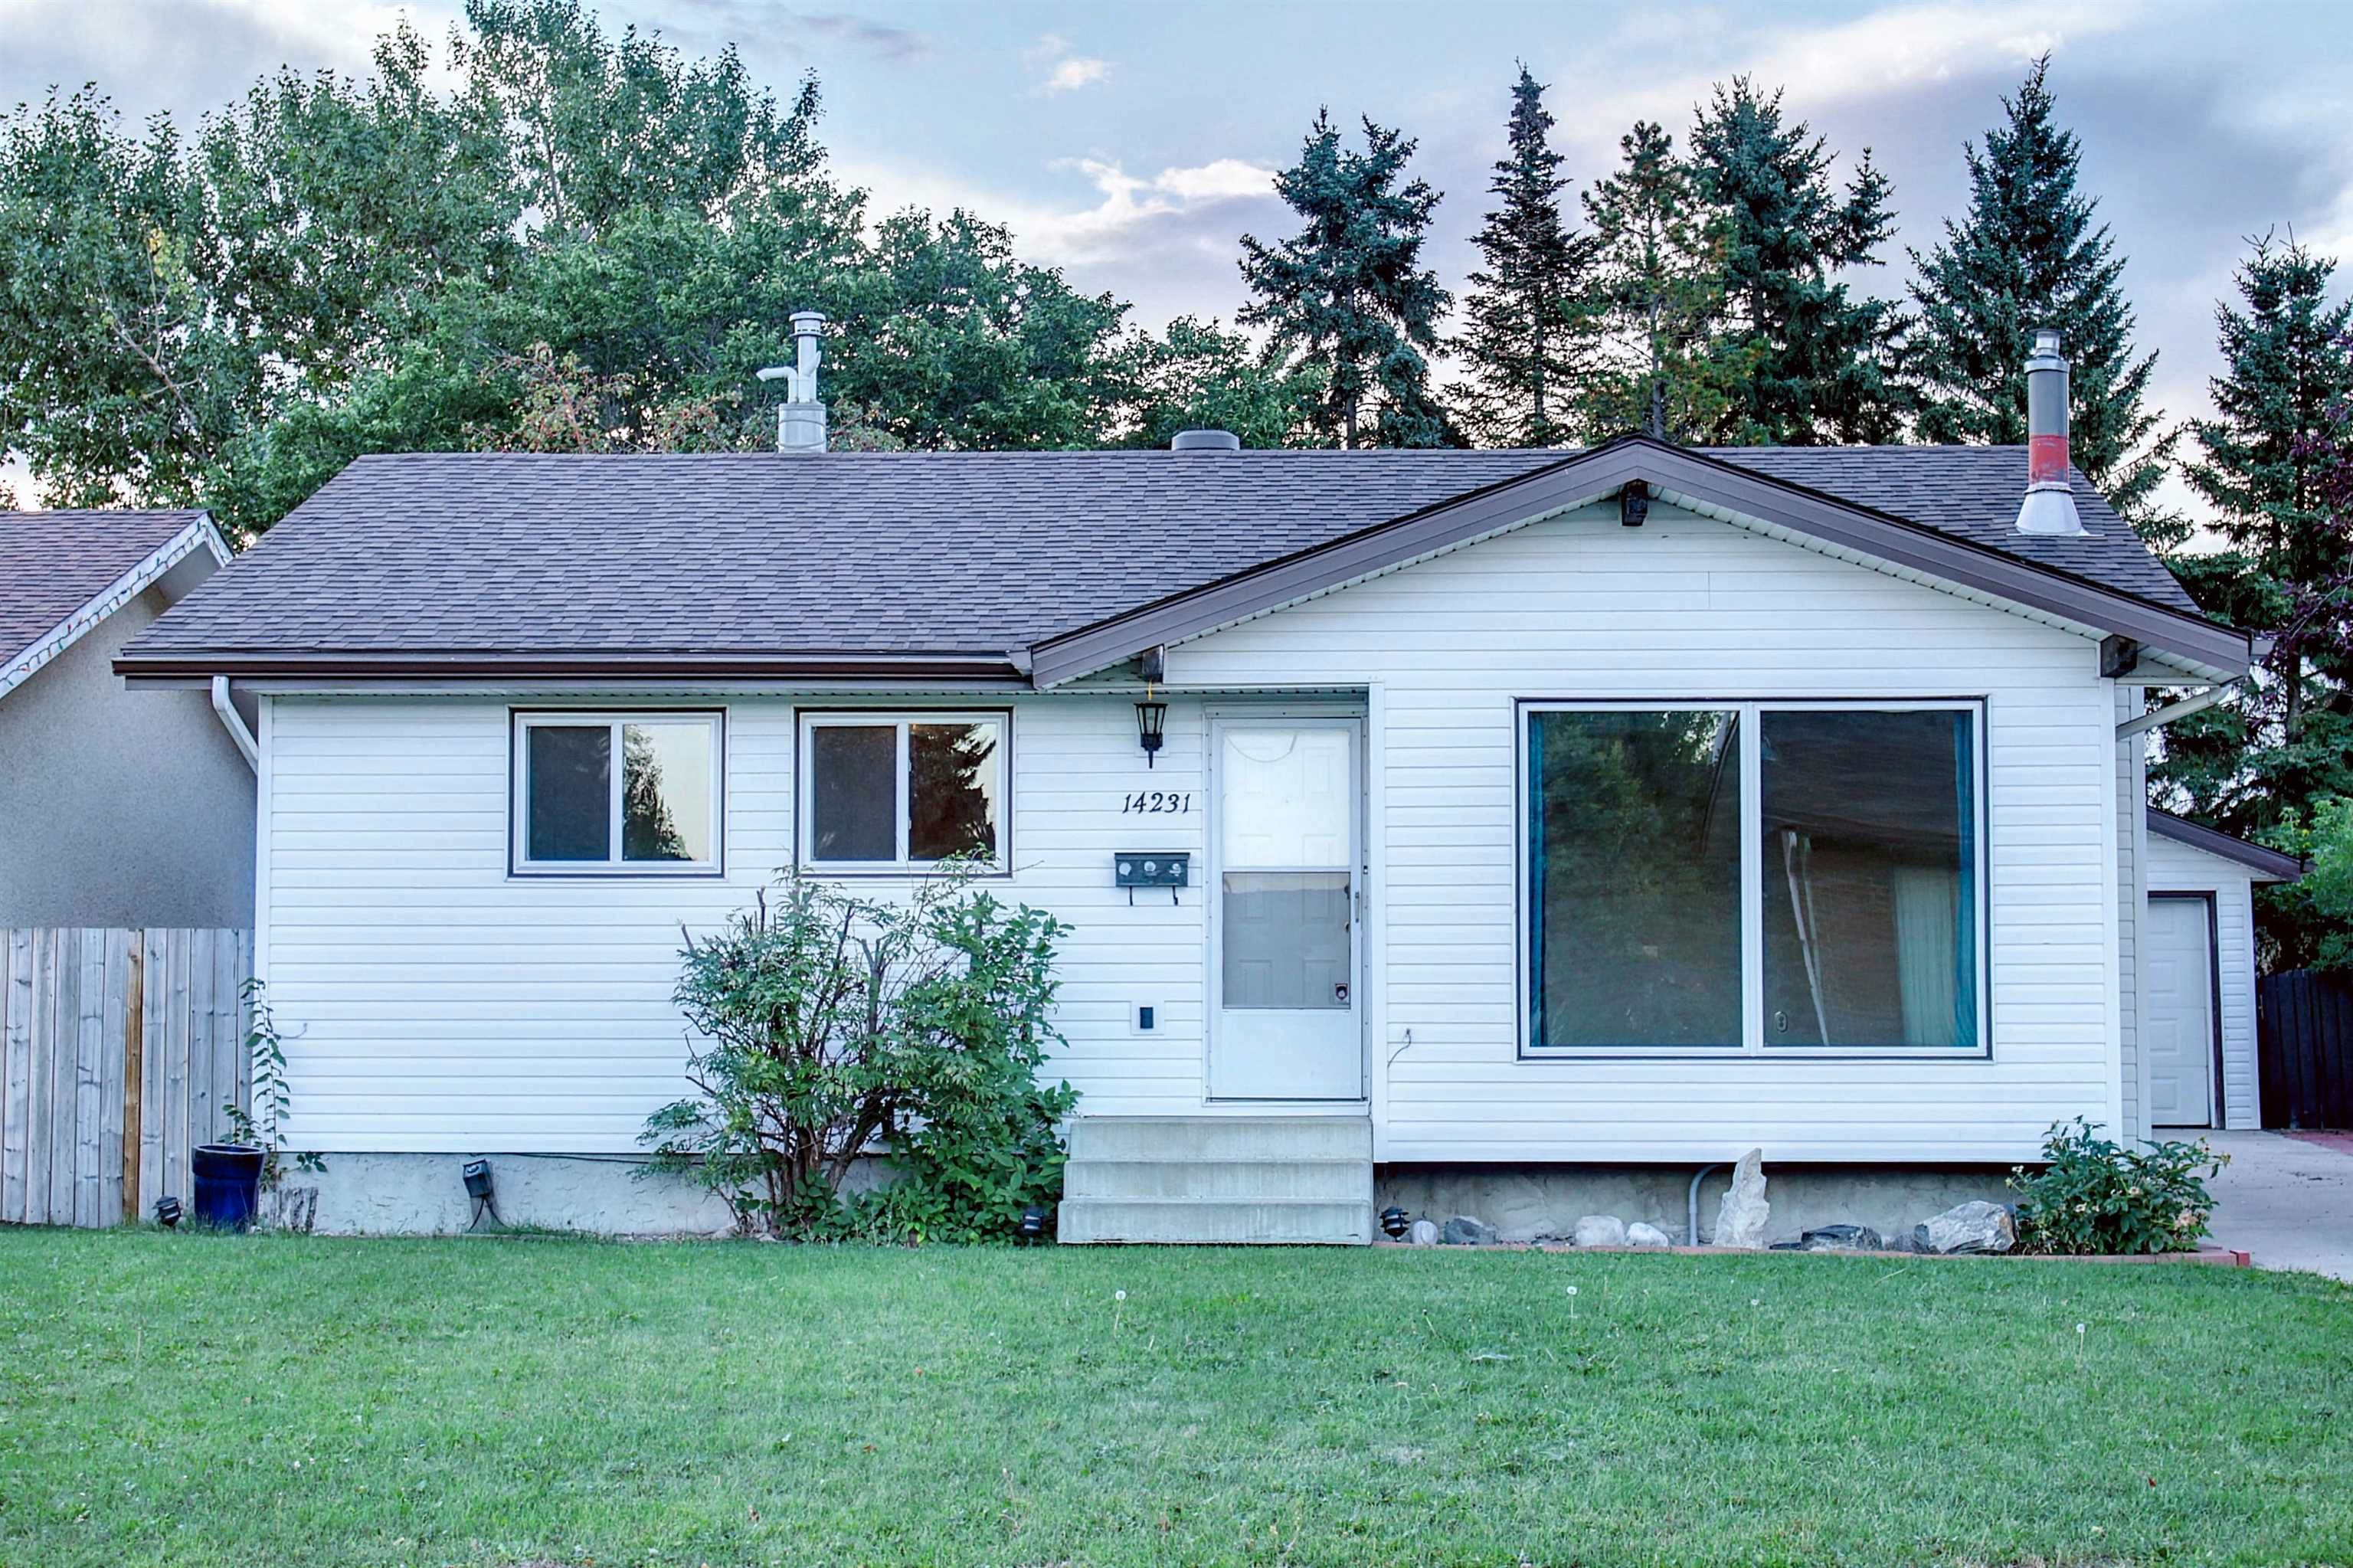 Main Photo: 14231 30 Street in Edmonton: Zone 35 House for sale : MLS®# E4261642